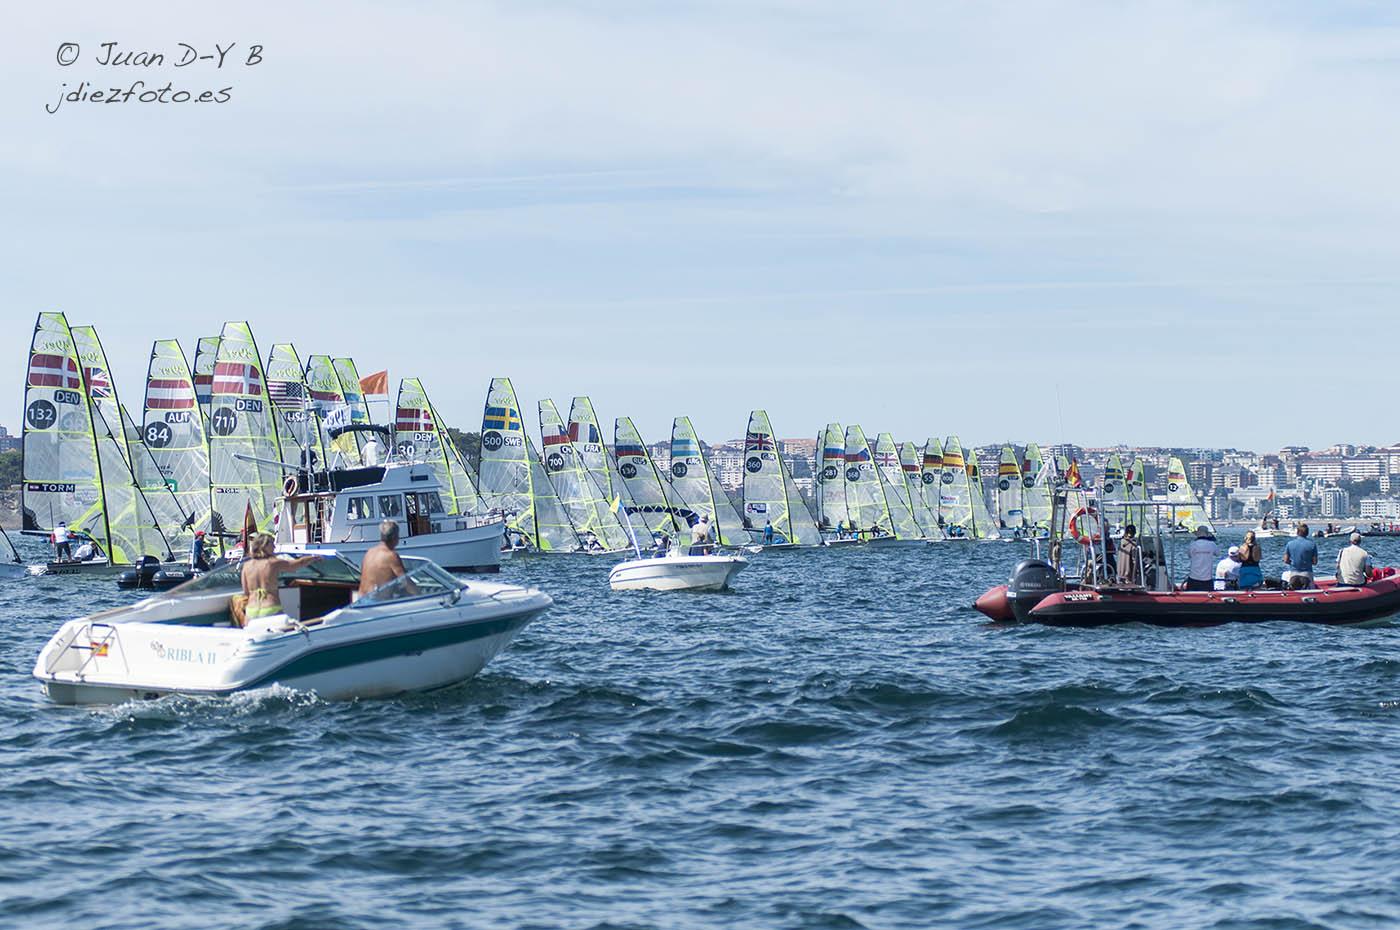 Cuarta jornada de regatas del Mundial de Vela 2014